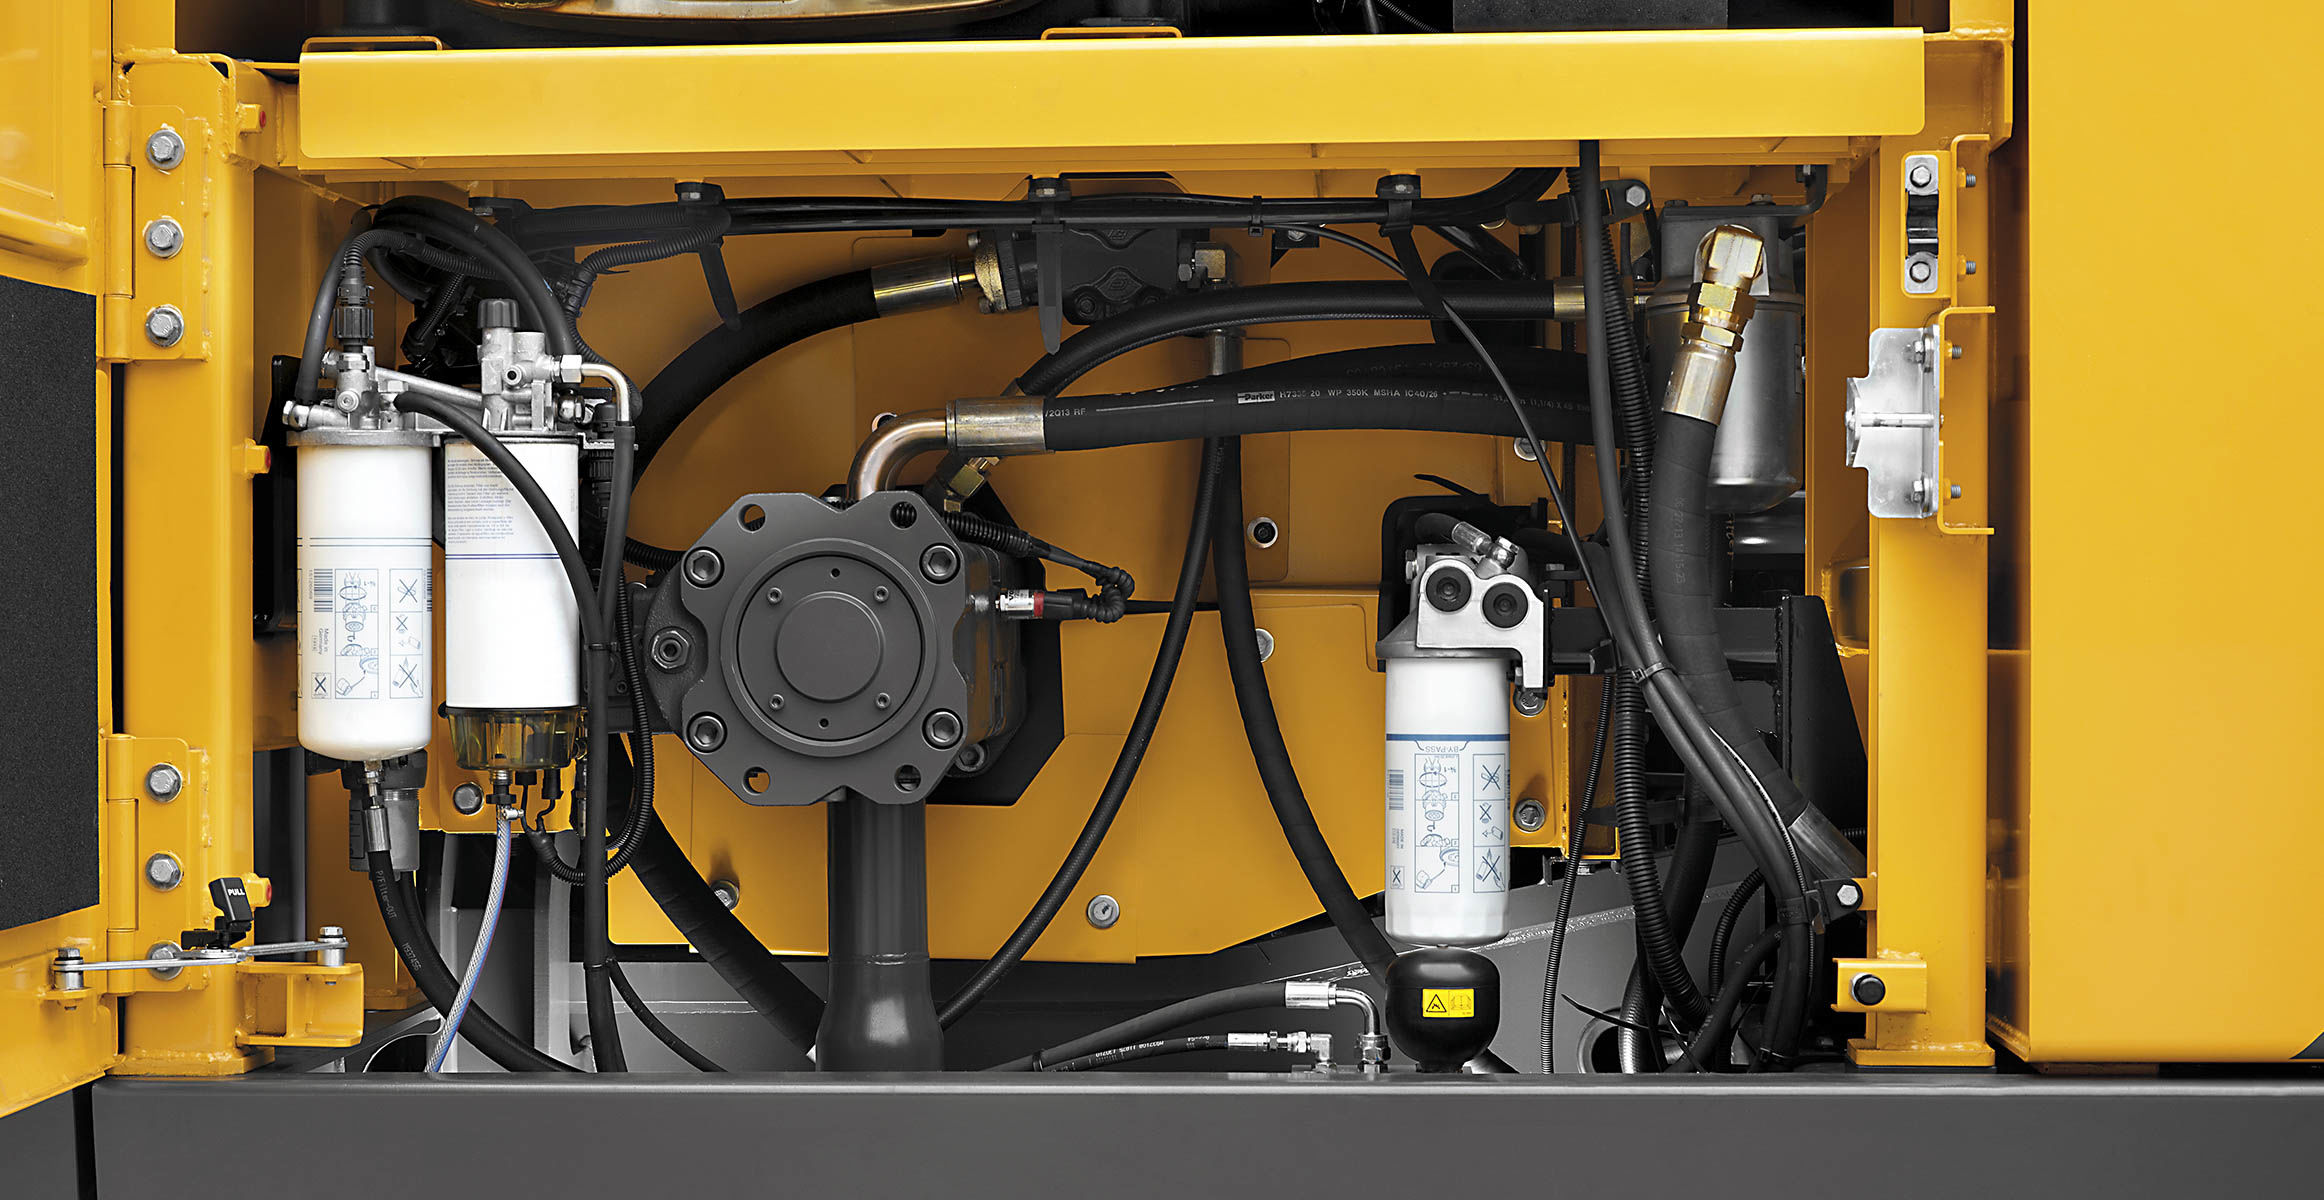 EC380E   Excavators   Overview   Volvo Construction Equipment